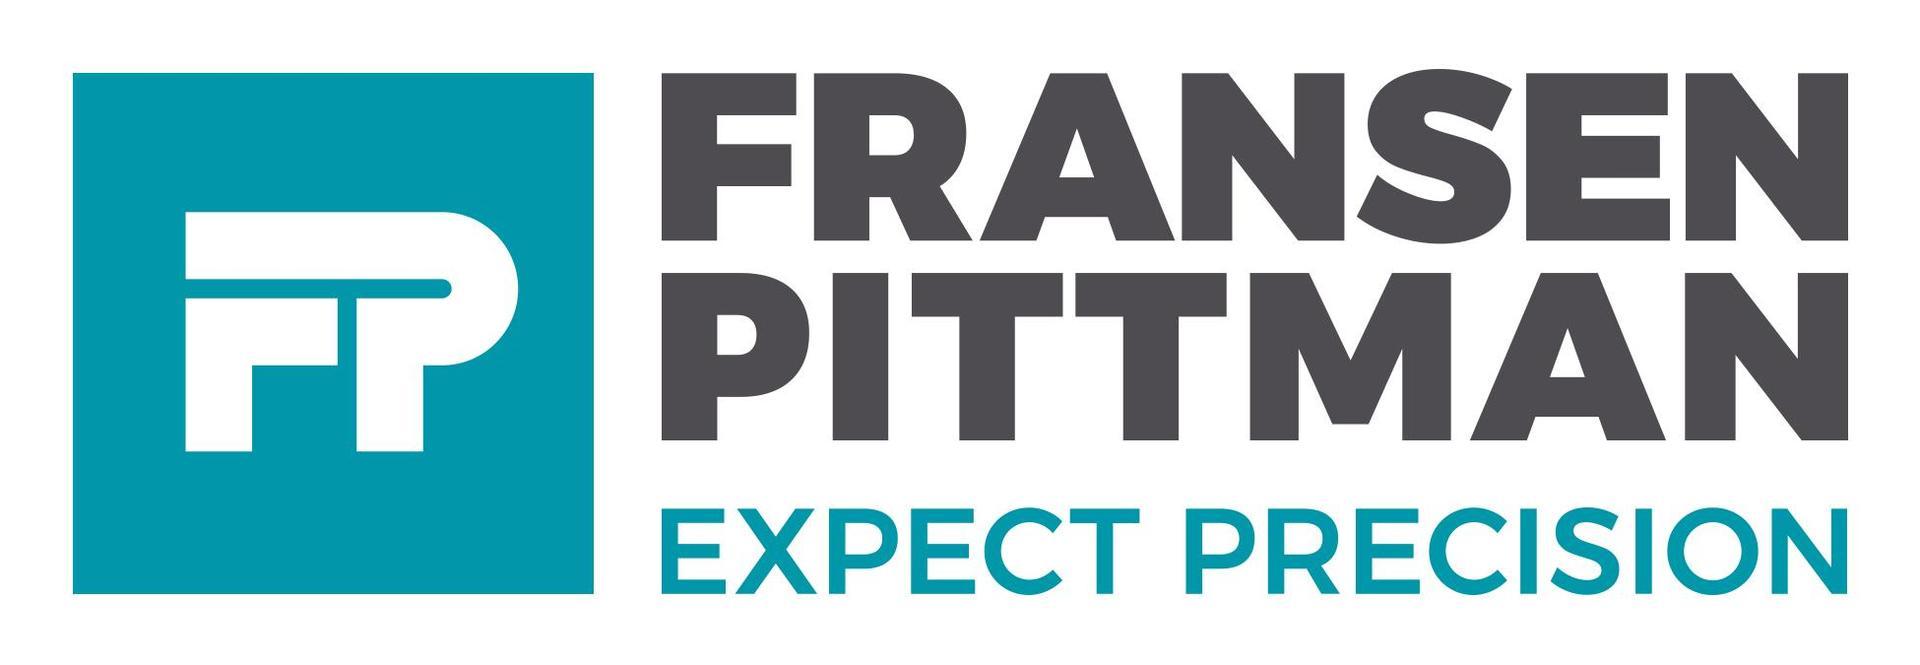 Fransen Pittman logo